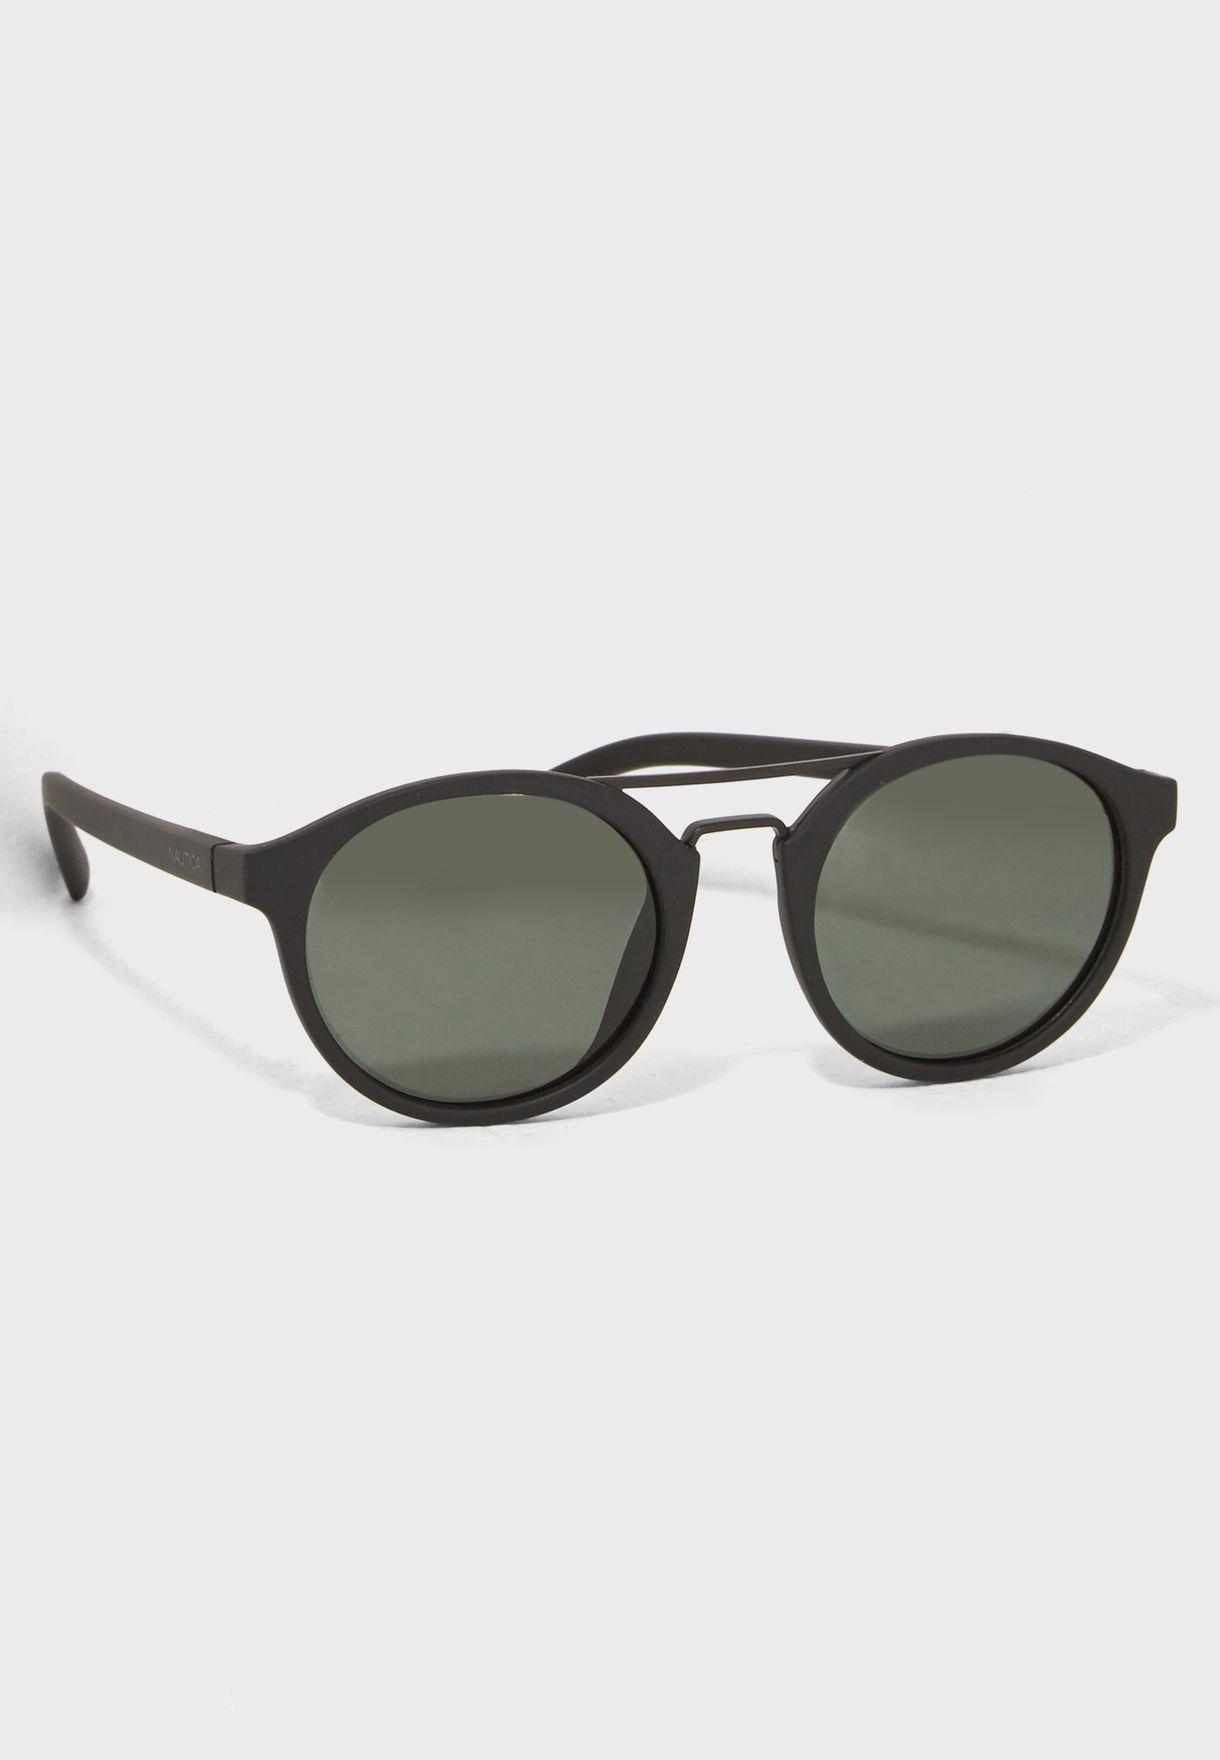 64355bd3a87 Shop Nautica black Round Sunglasses N3626SP-005 for Men in UAE ...